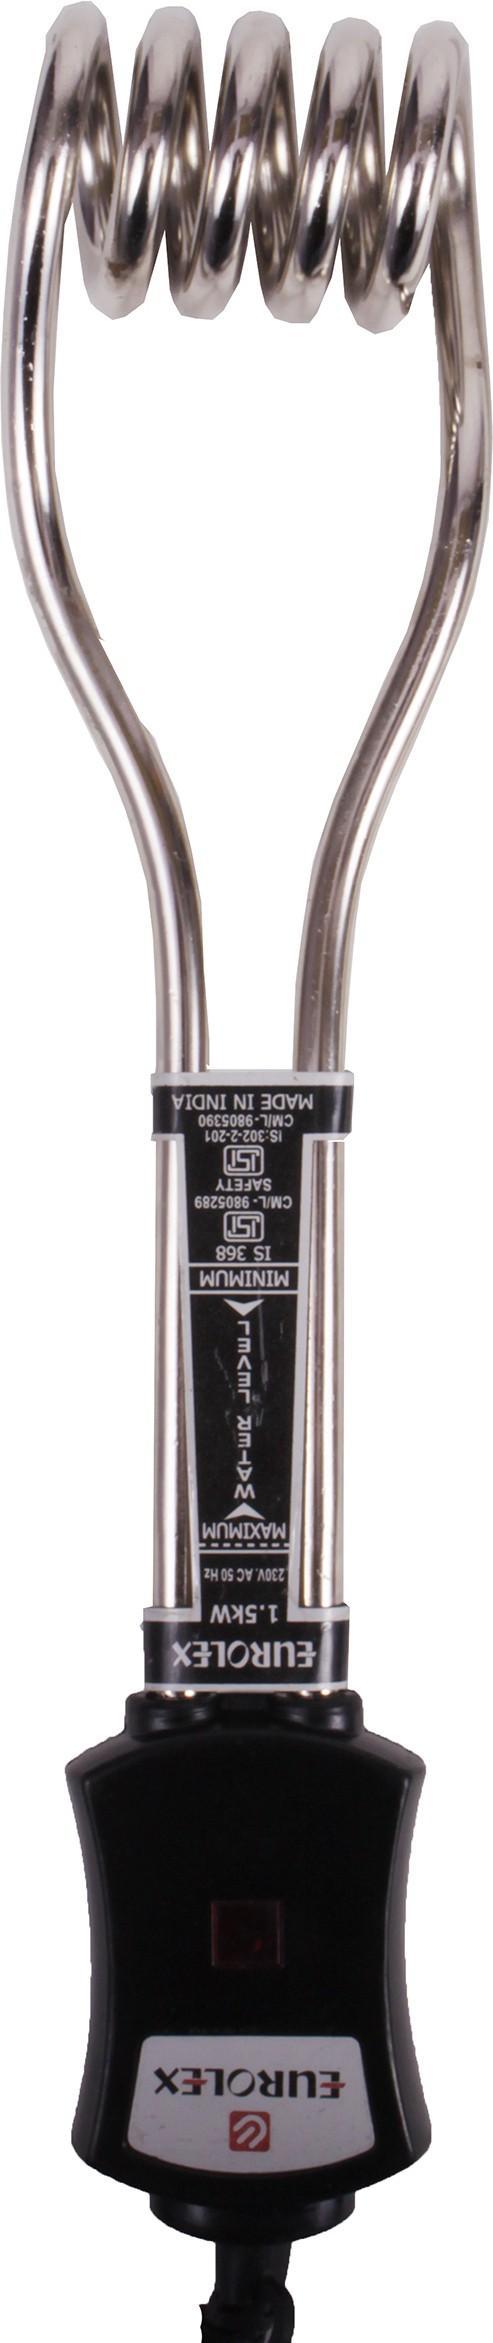 EUROLEX IMRD1615 1500 W Immersion Heater Rod(Water)